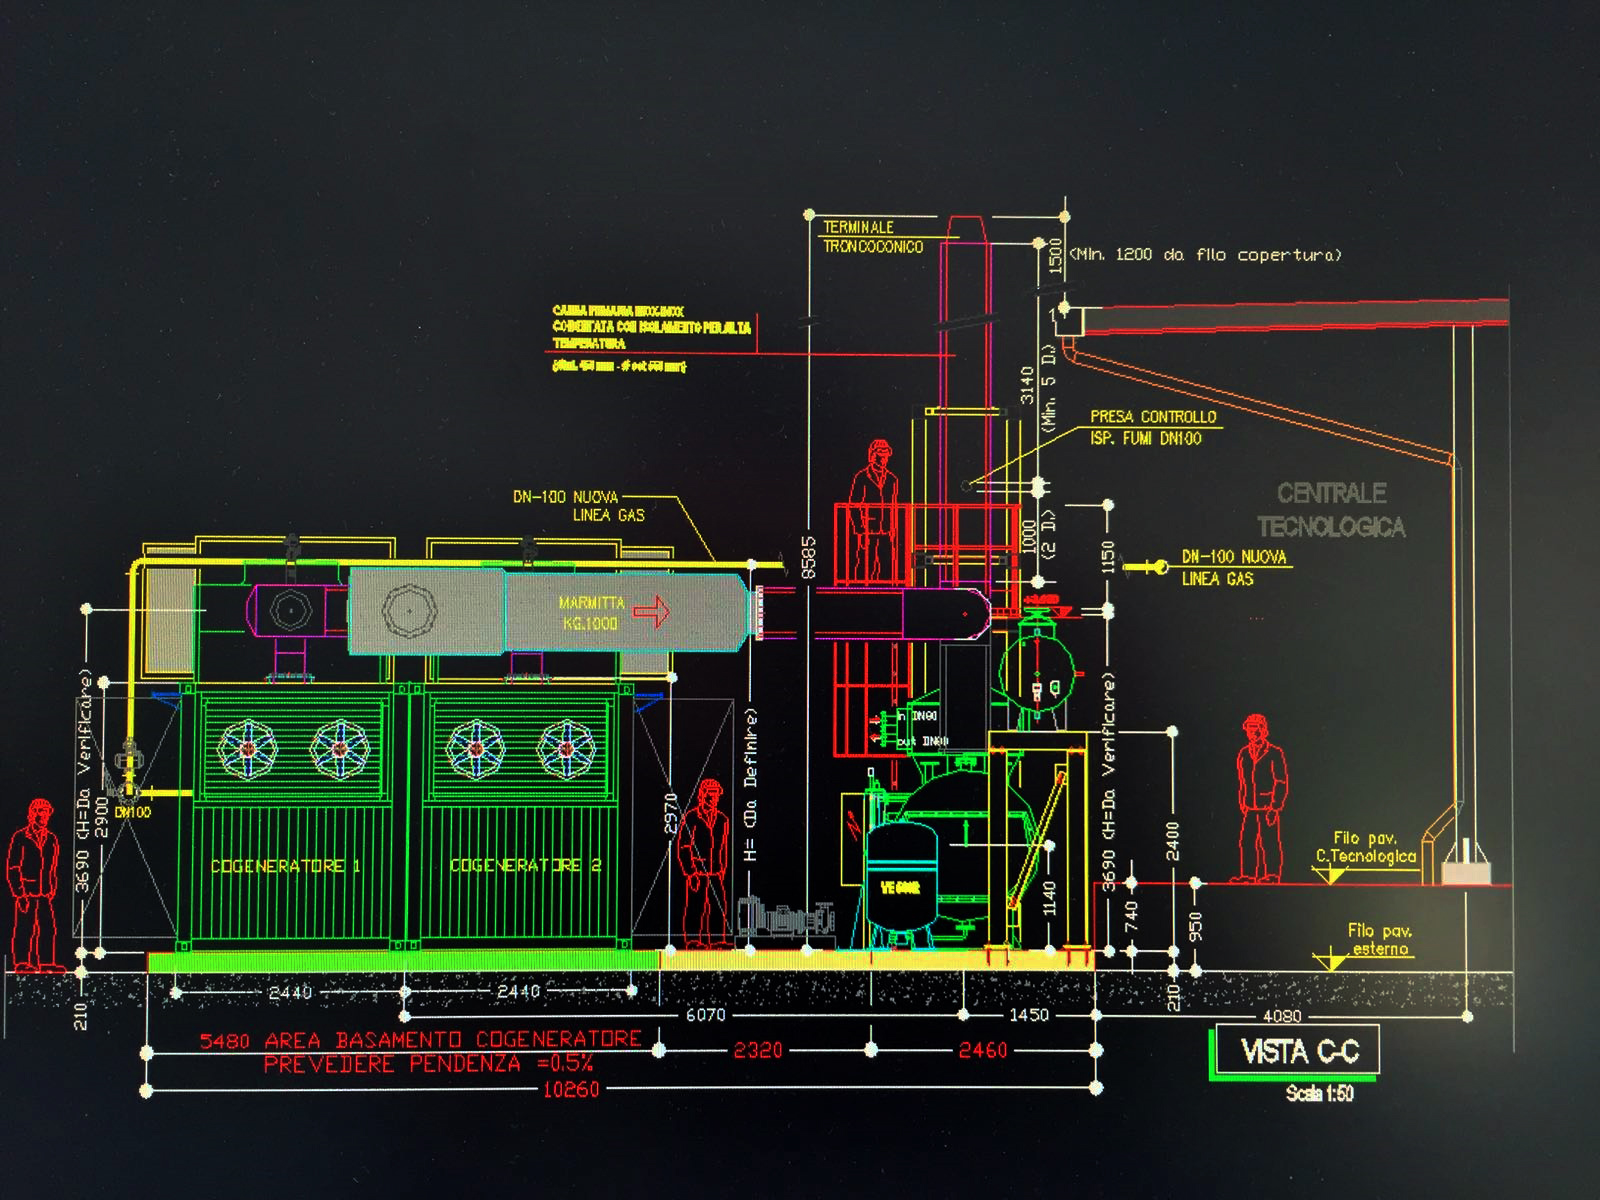 Cogeneration And Trigeneration Plants Engine Diagram